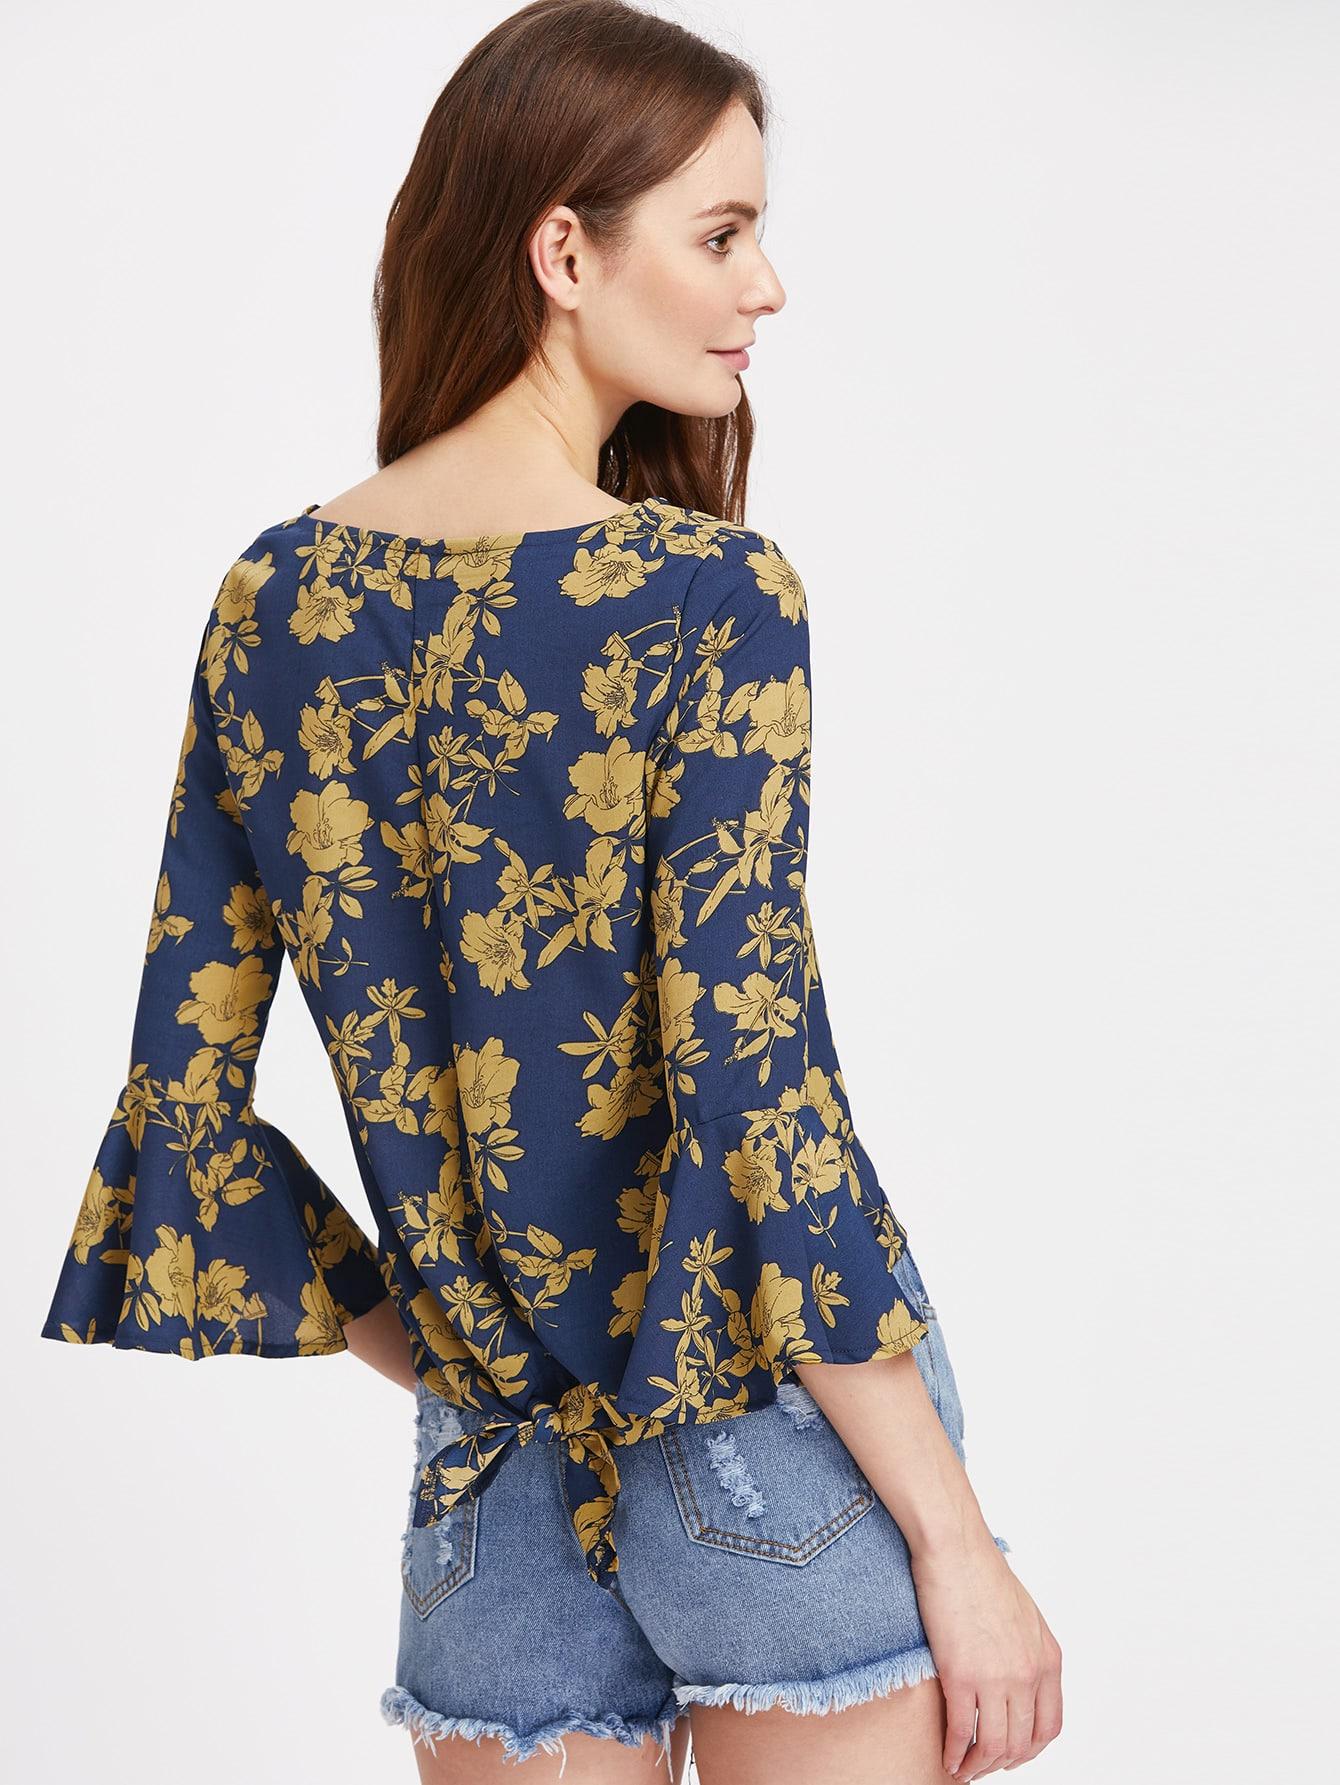 blouse back designs with knot wwwimgkidcom the image